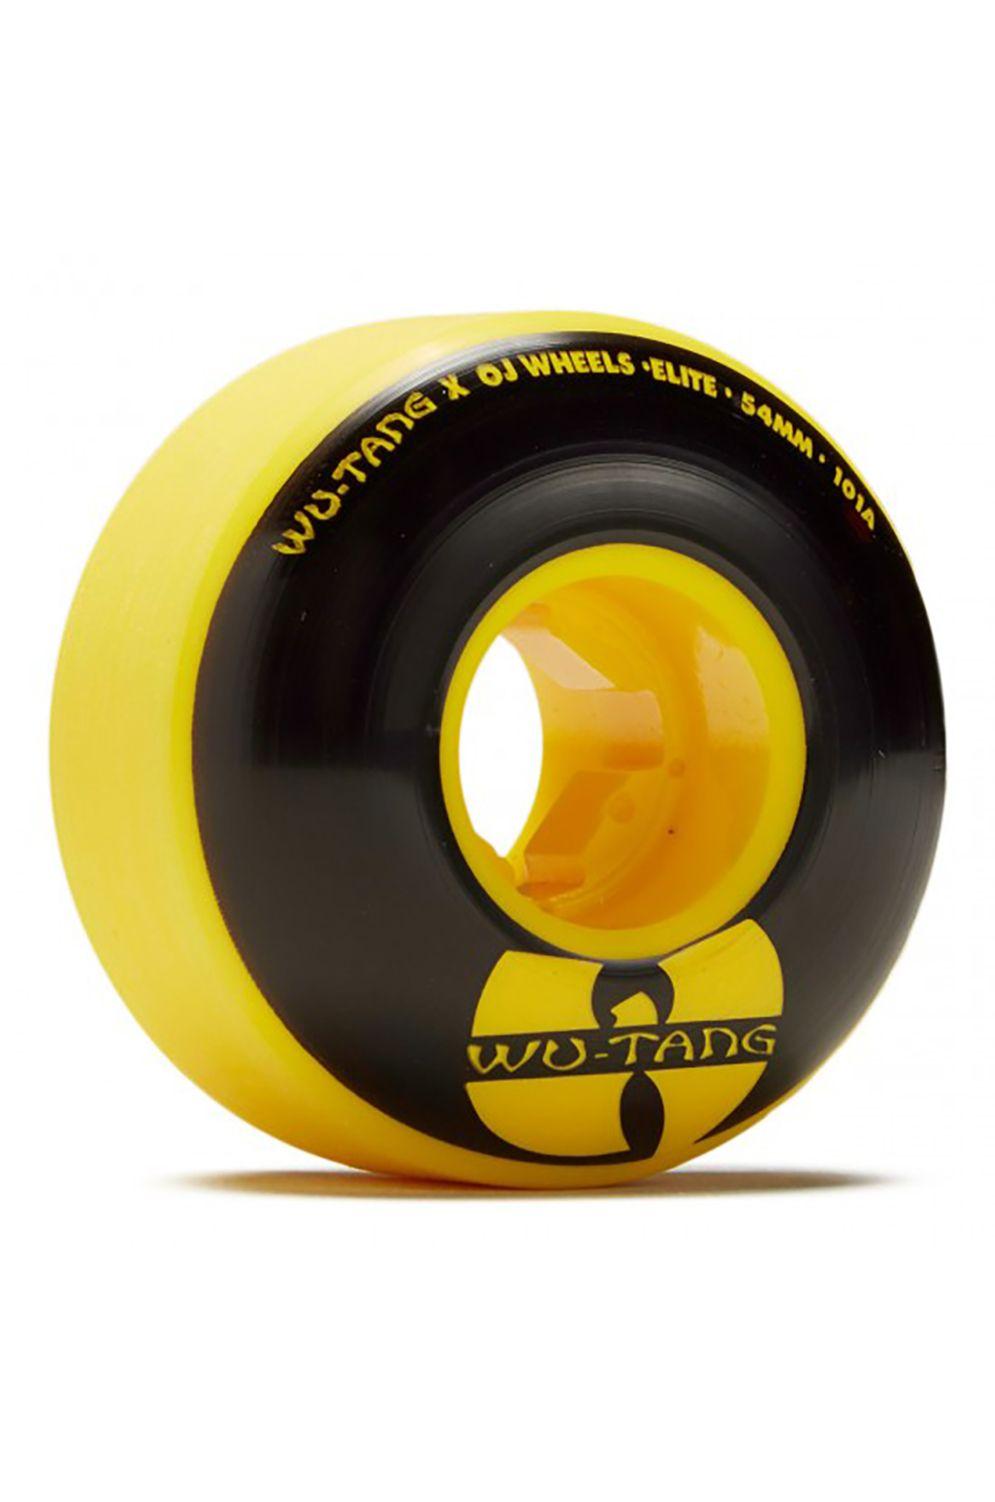 OJ Wheels Skate Wheels 54MM WU-TANG ELITE EZ EDGE 101A Black